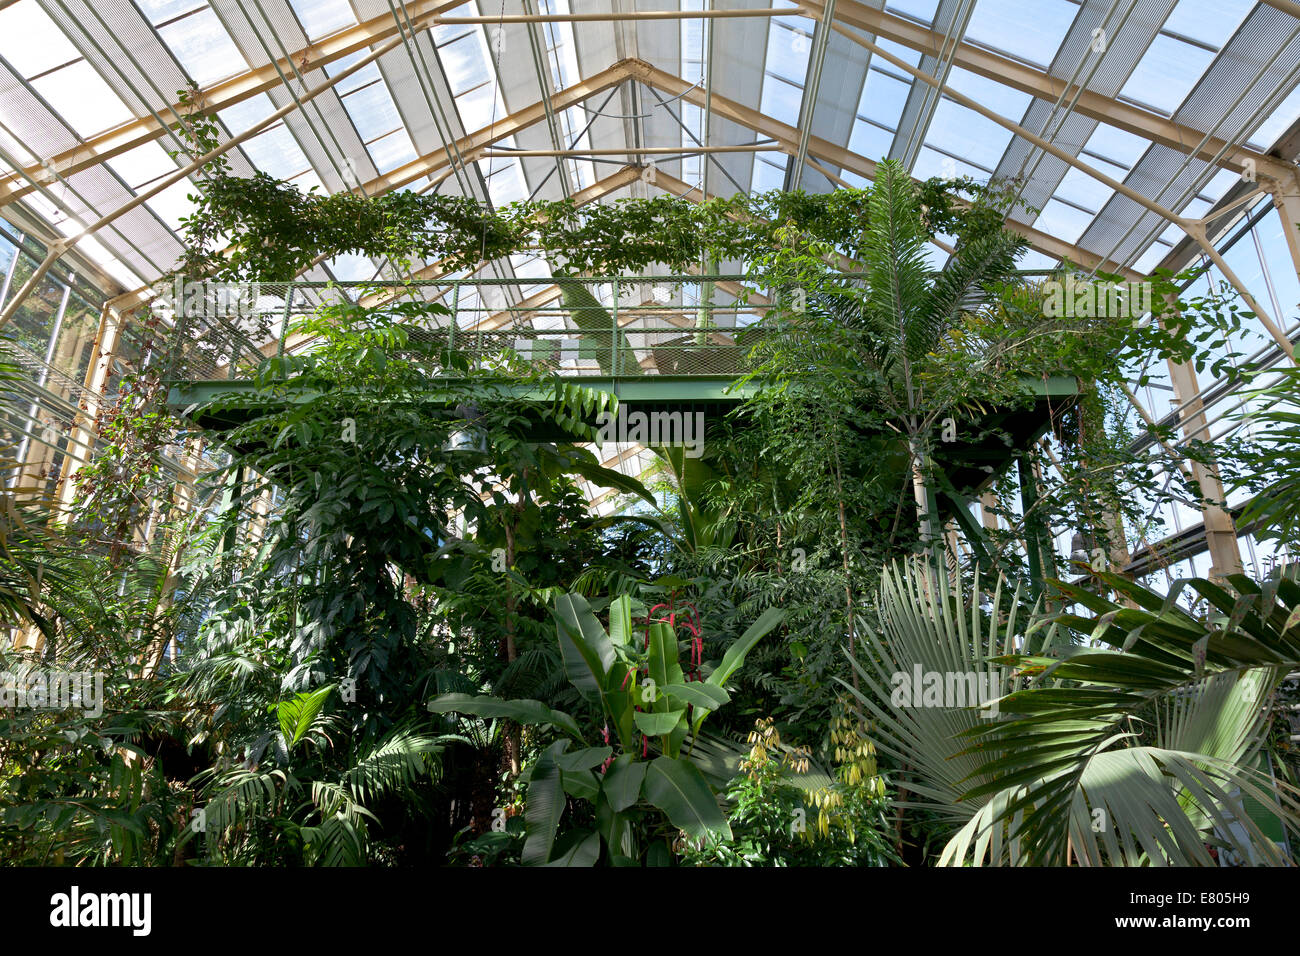 Botanische Tuin Leiden : Tropical greenhouse in the hortus botanicus in leiden holland